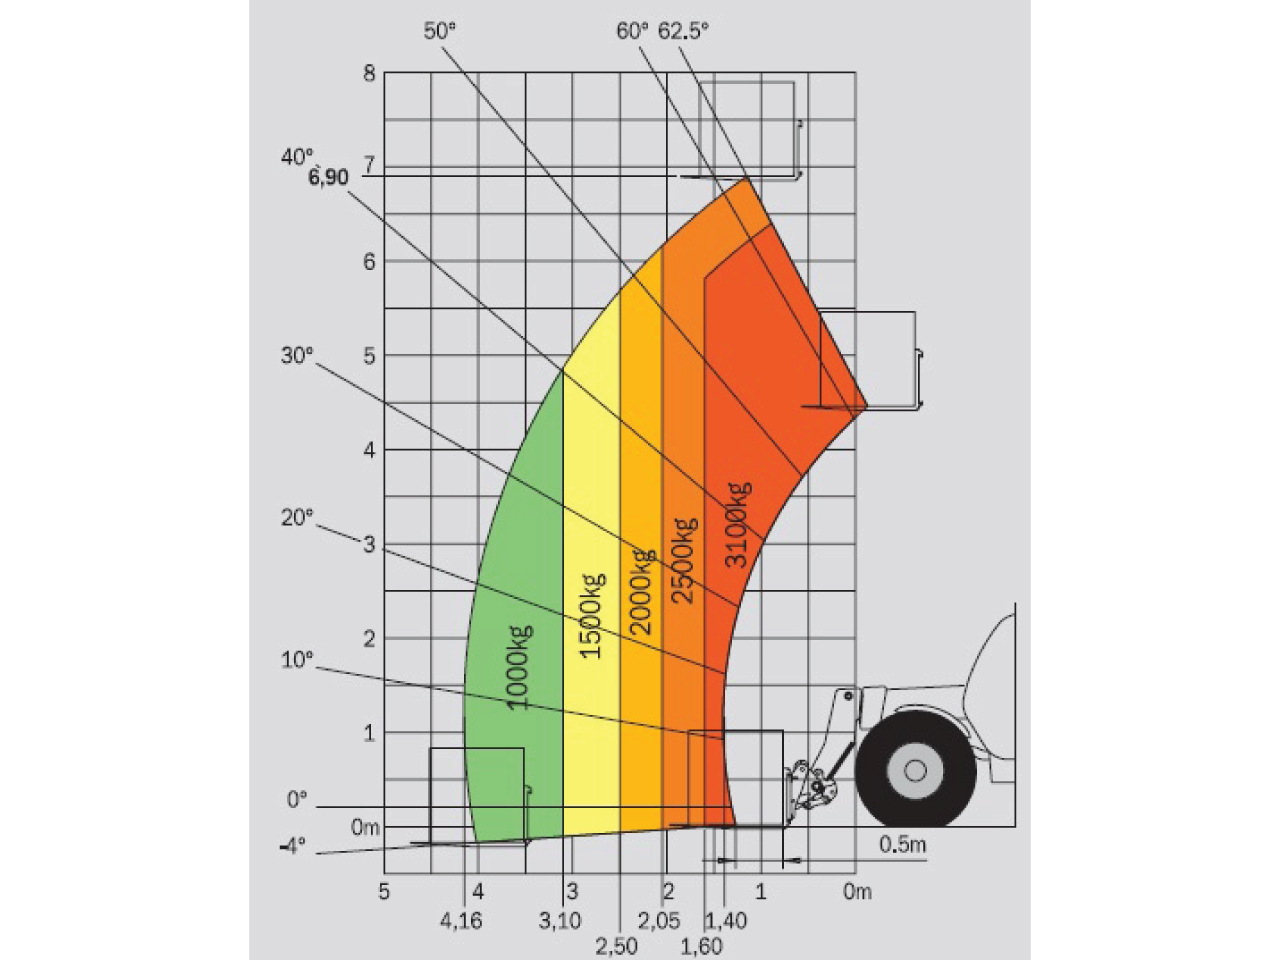 Manitou-MLT-731-Telehandler-Diagram